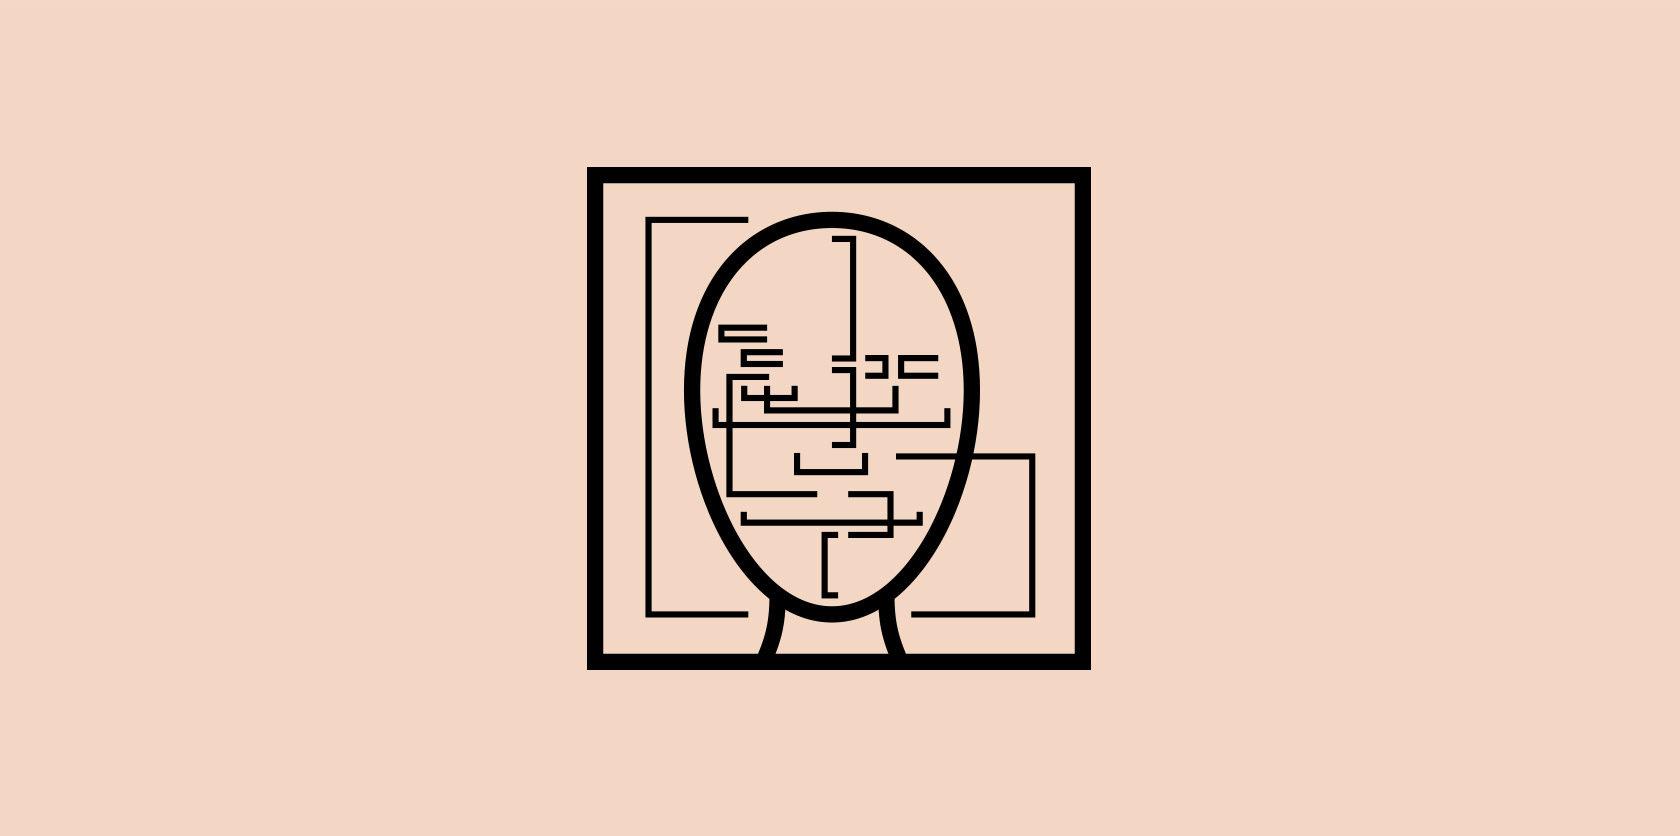 Biometric Bias facial recognition algorithm design by Furia